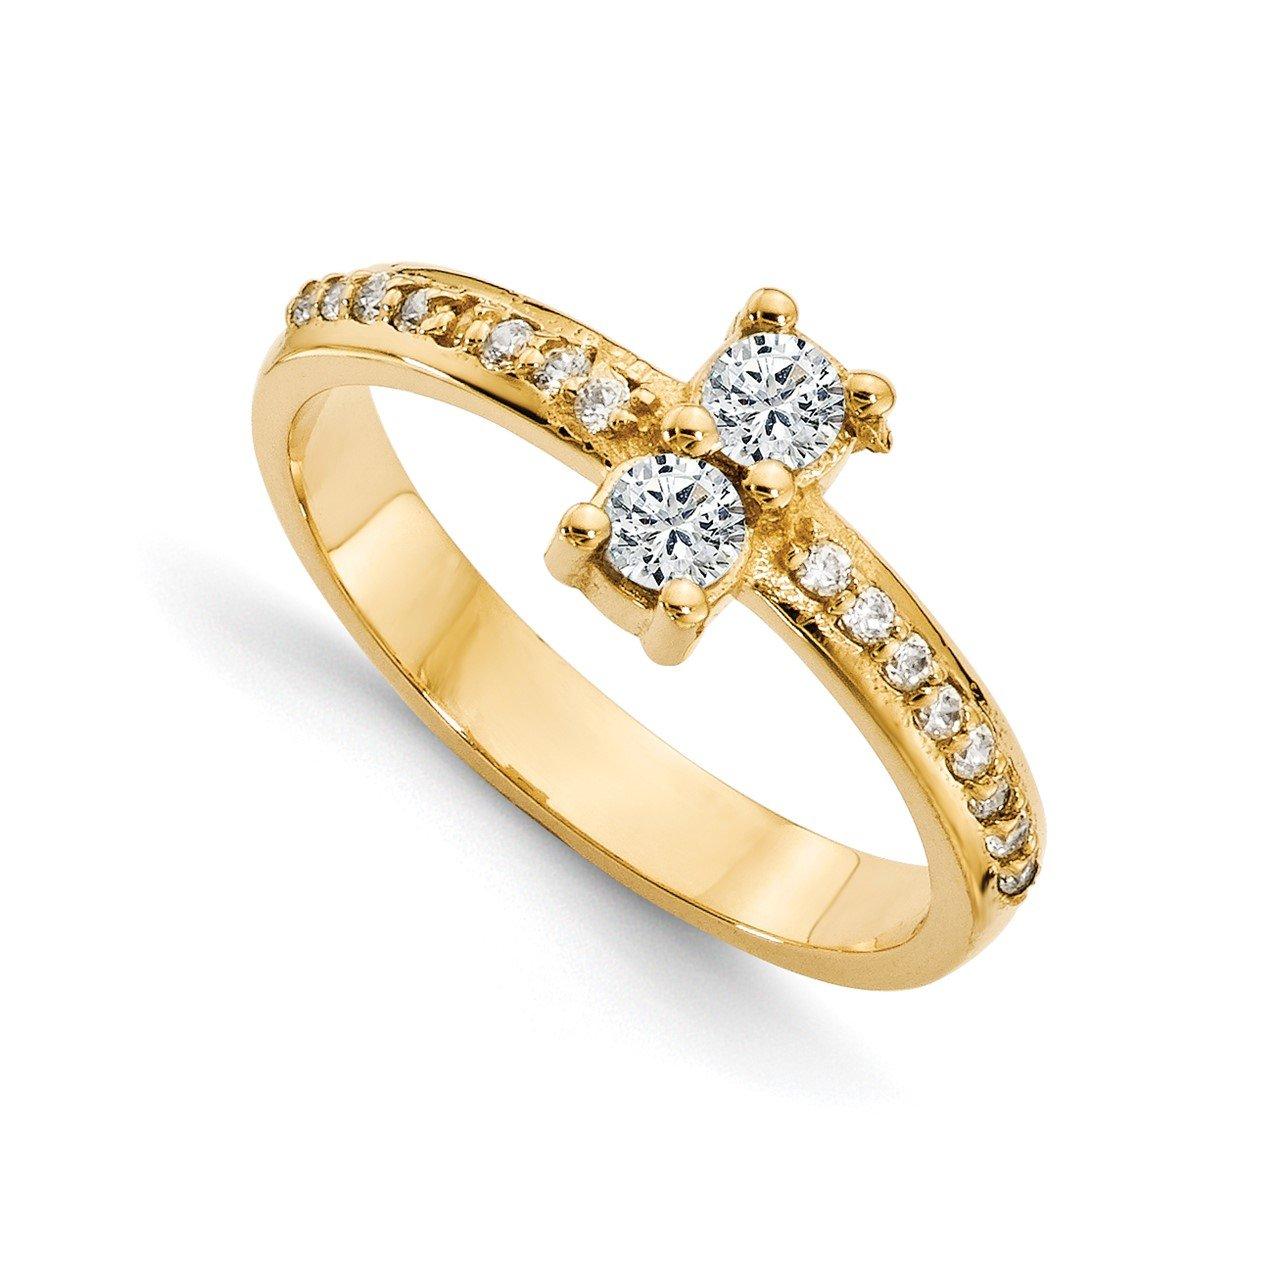 14ky A Diamond 2-stone Ring Semi-Mount - 3.1 mm center stones